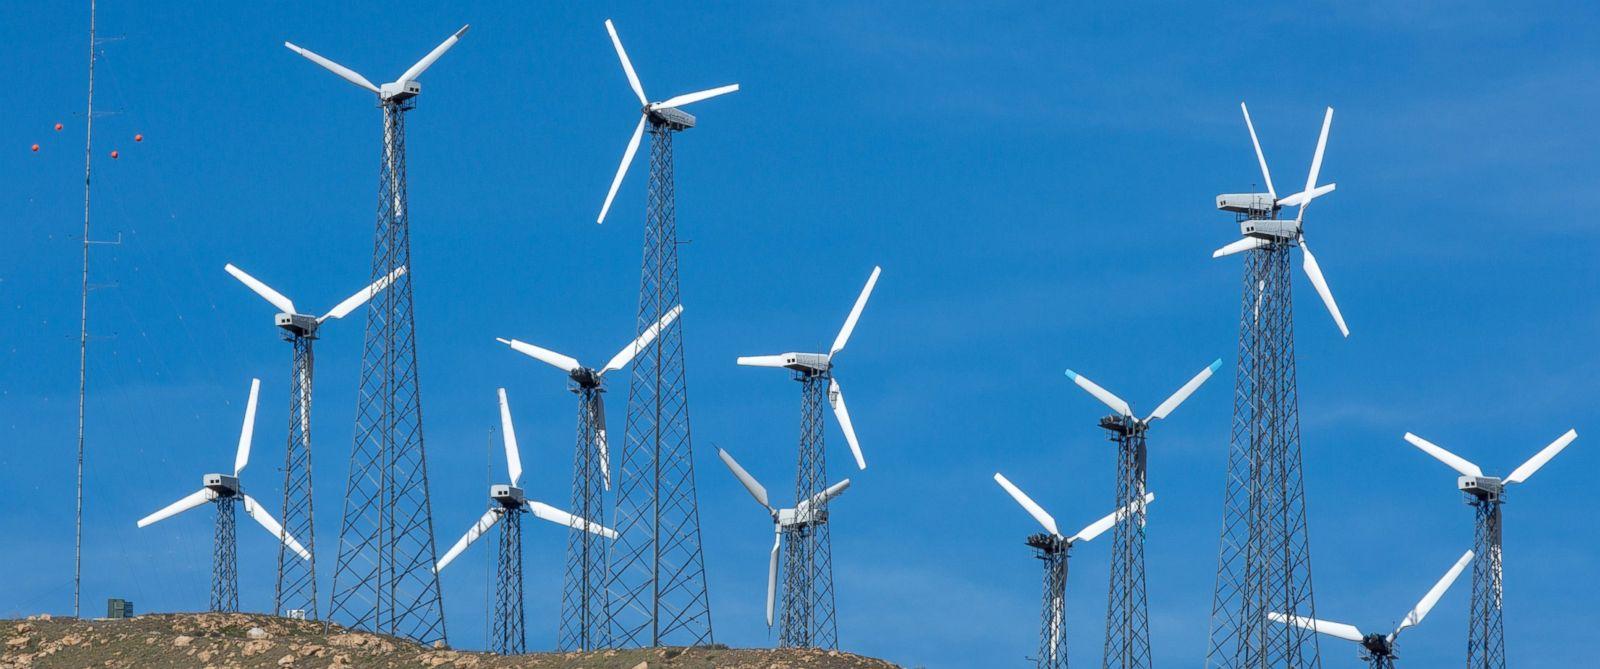 PHOTO: Wind turbines line a mountain ridge along Highway 58 as viewed on April 4, 2017, near Tehachapi, California.